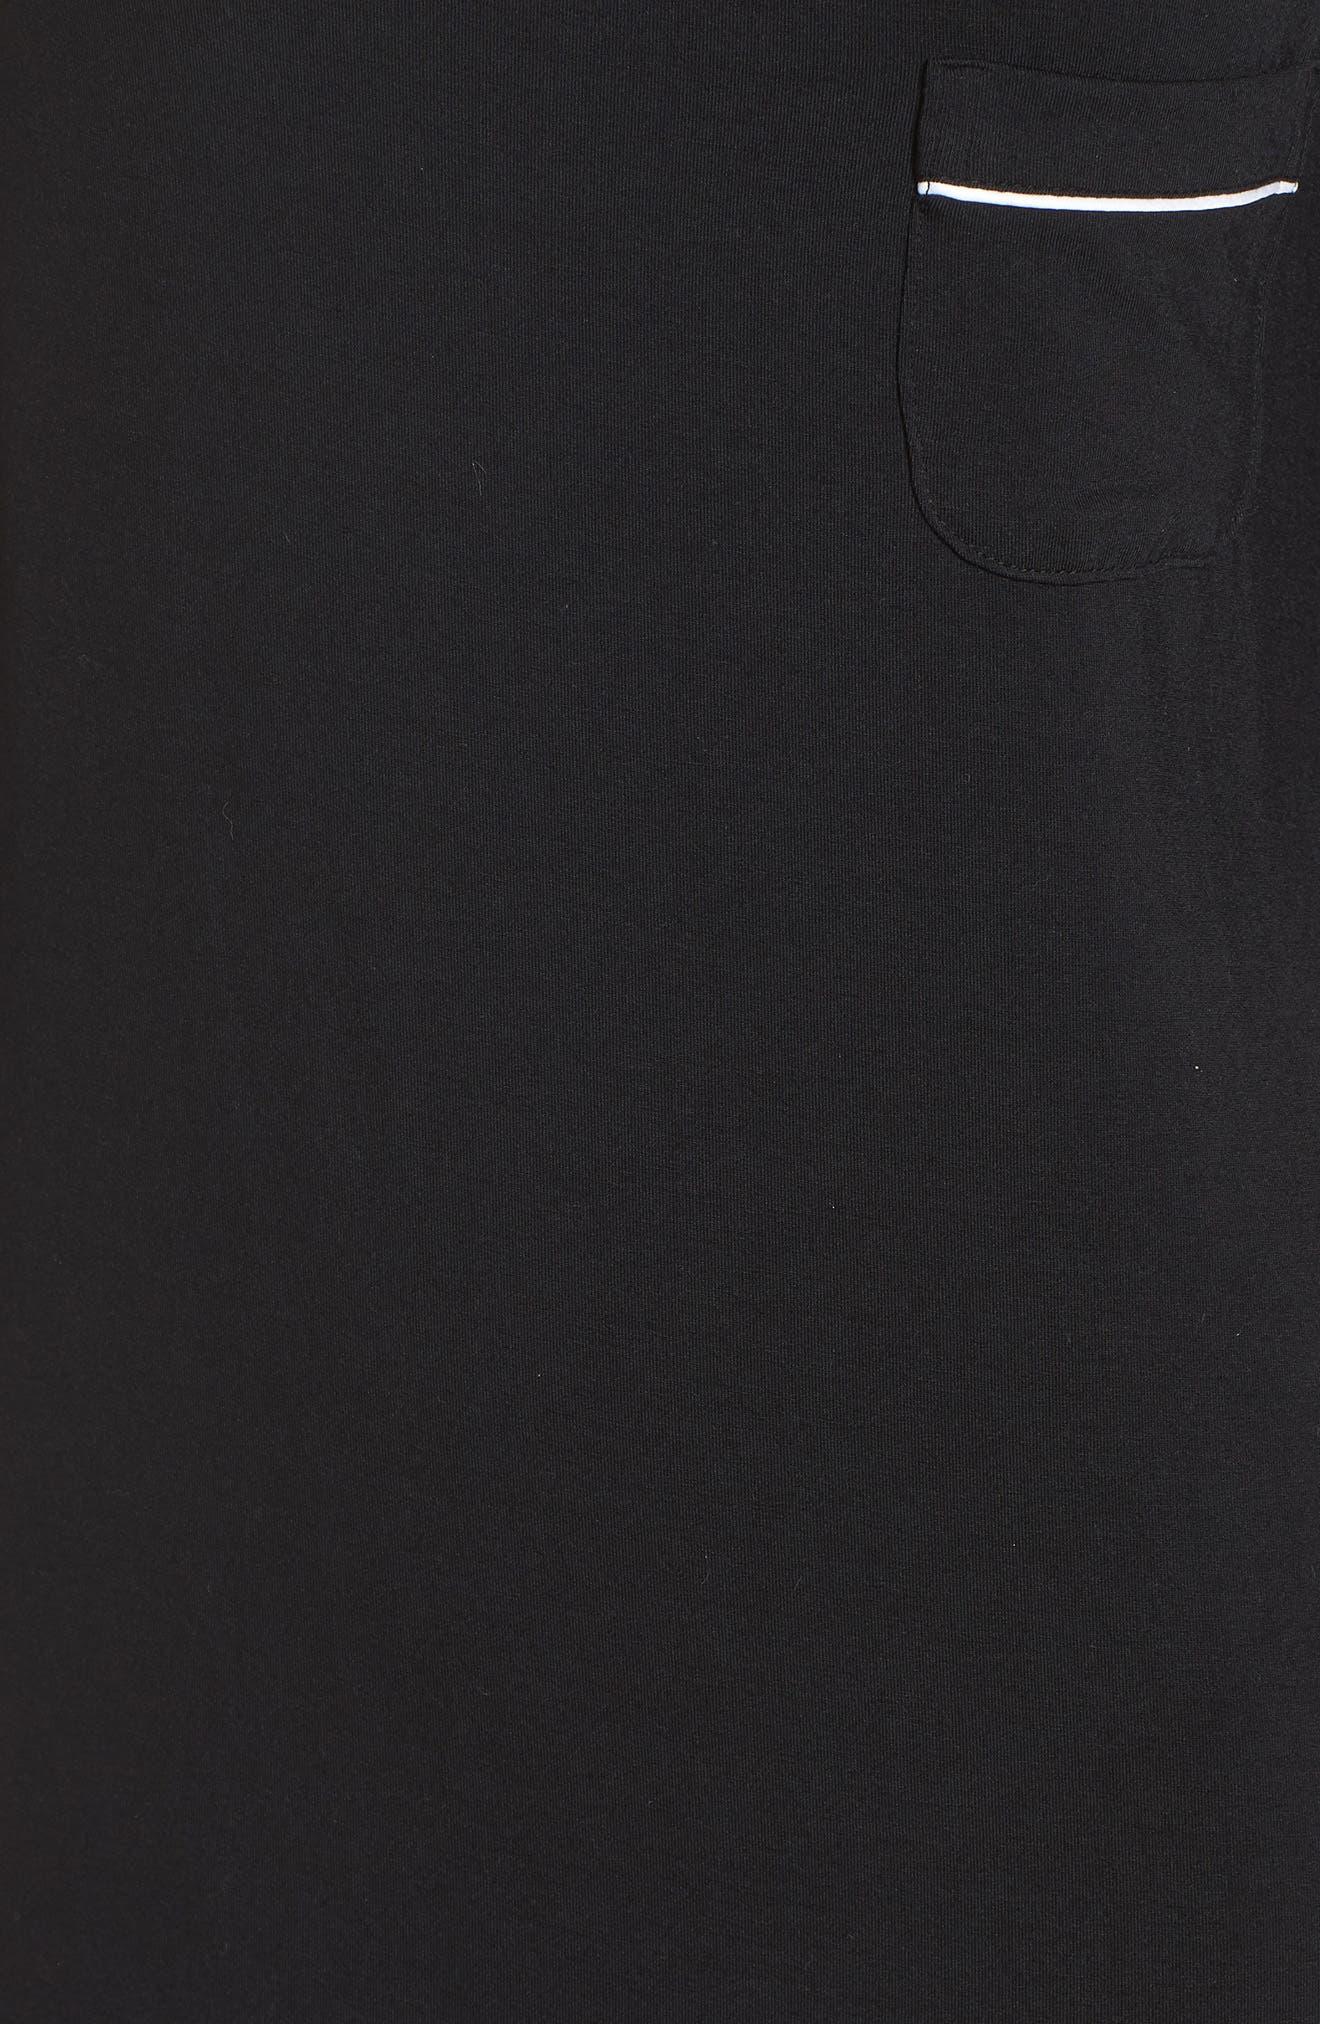 Moonlight Nightshirt,                             Alternate thumbnail 5, color,                             Black